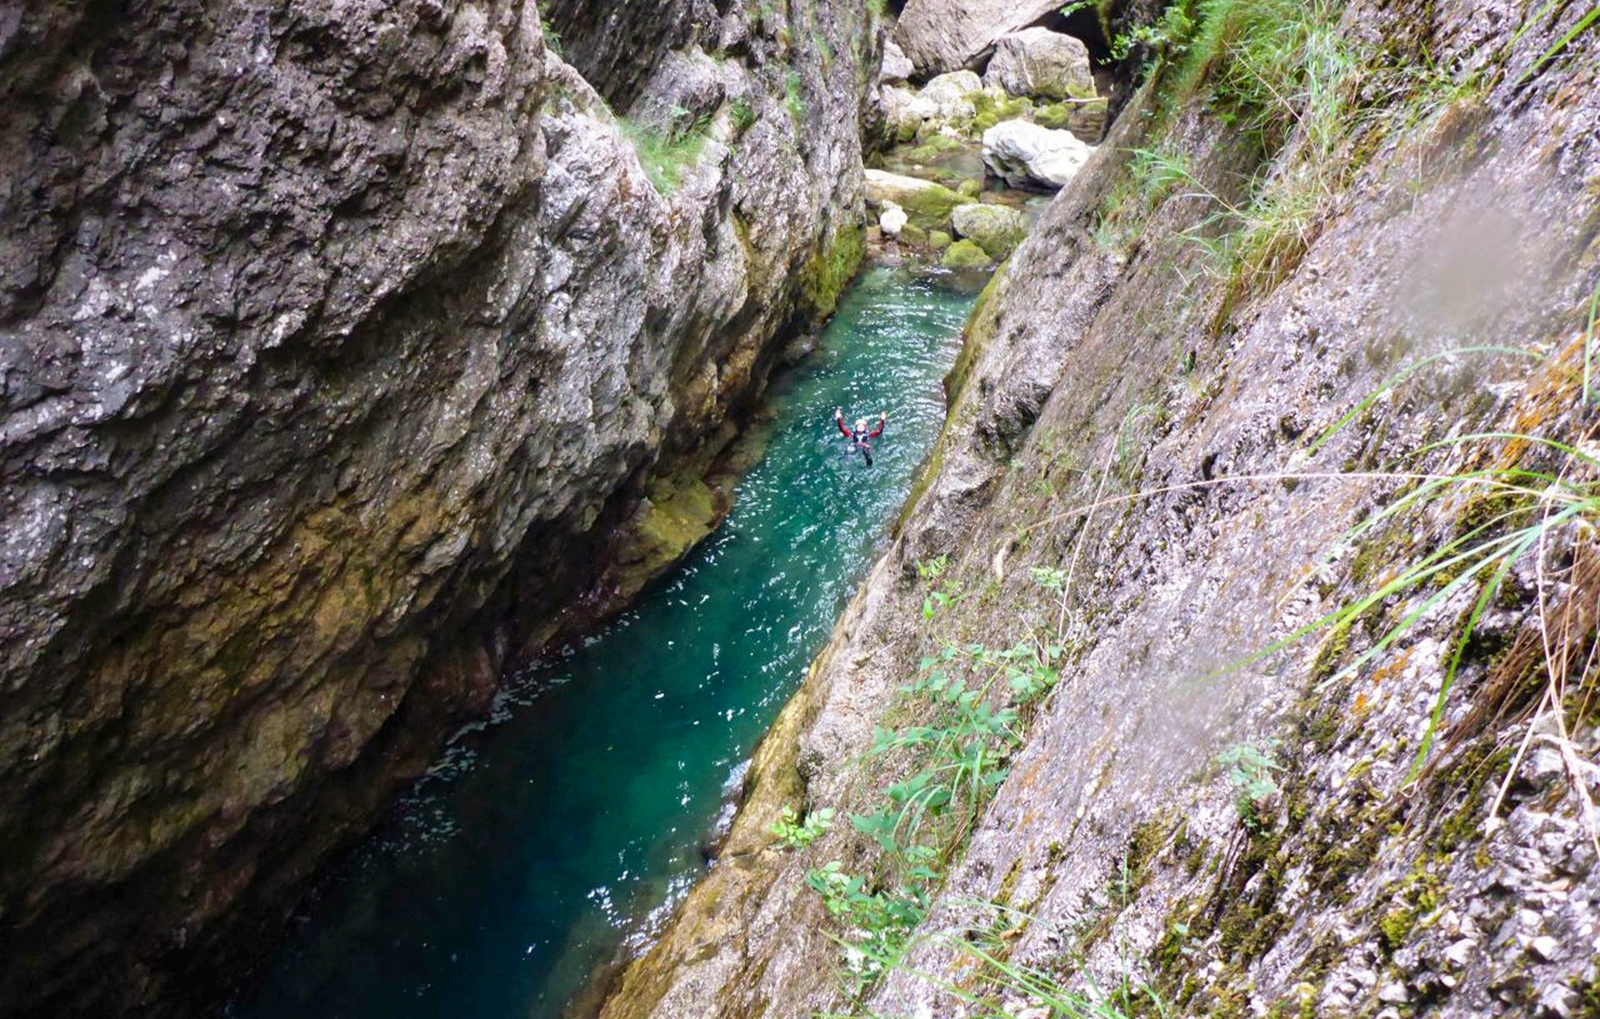 canyoning-tour-schneizlreuth-bg5